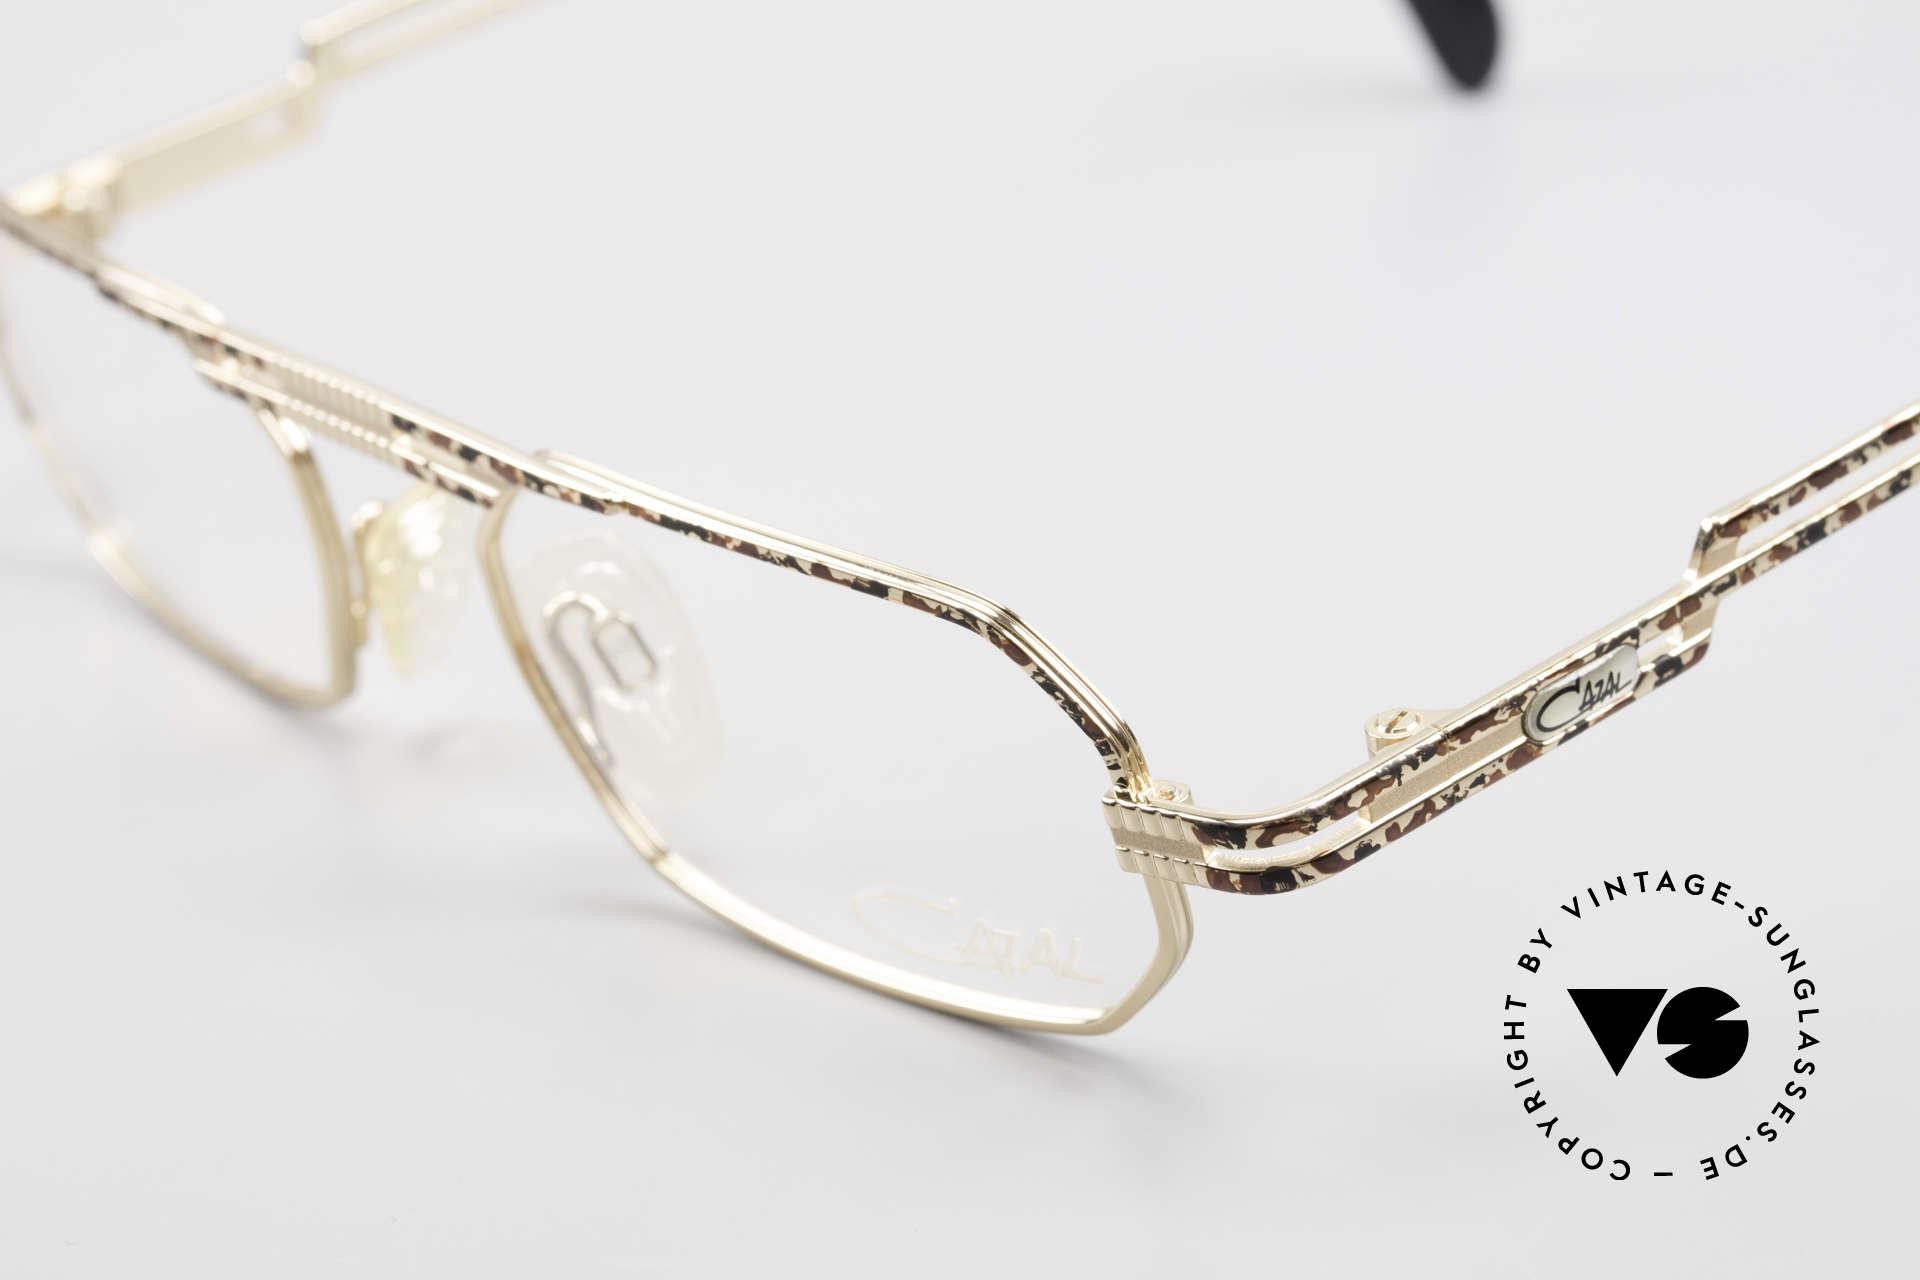 Cazal 767 Square Vintage Eyeglasses 90's, unworn (like all our rare vintage Cazal eyeglasses), Made for Men and Women